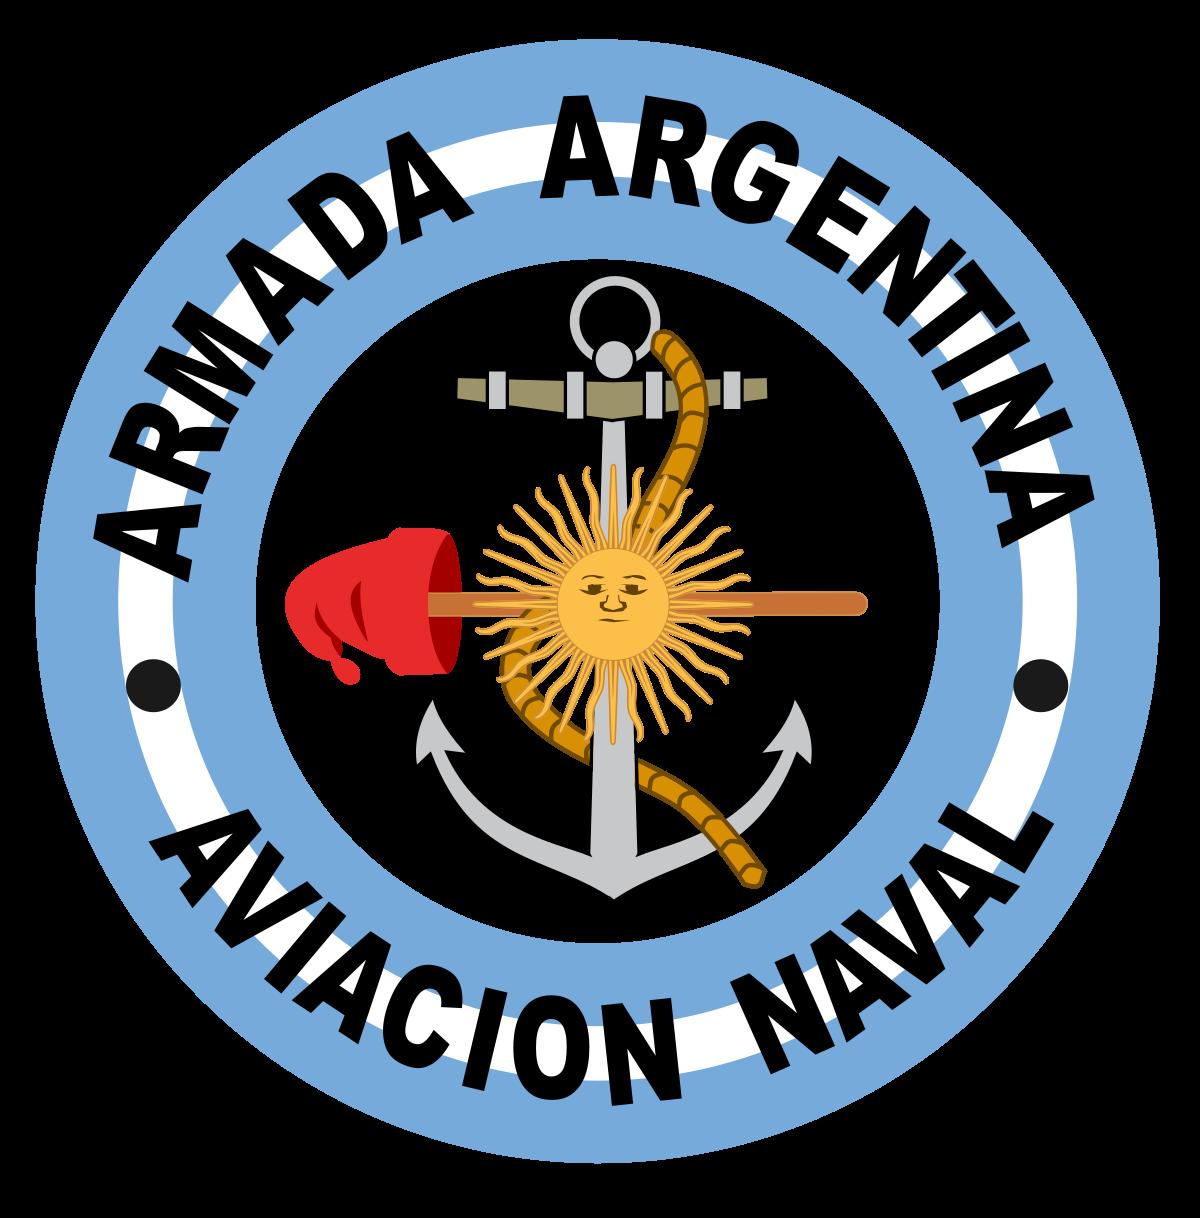 Pilot clipart pilot navy. Argentine naval aviation wikipedia